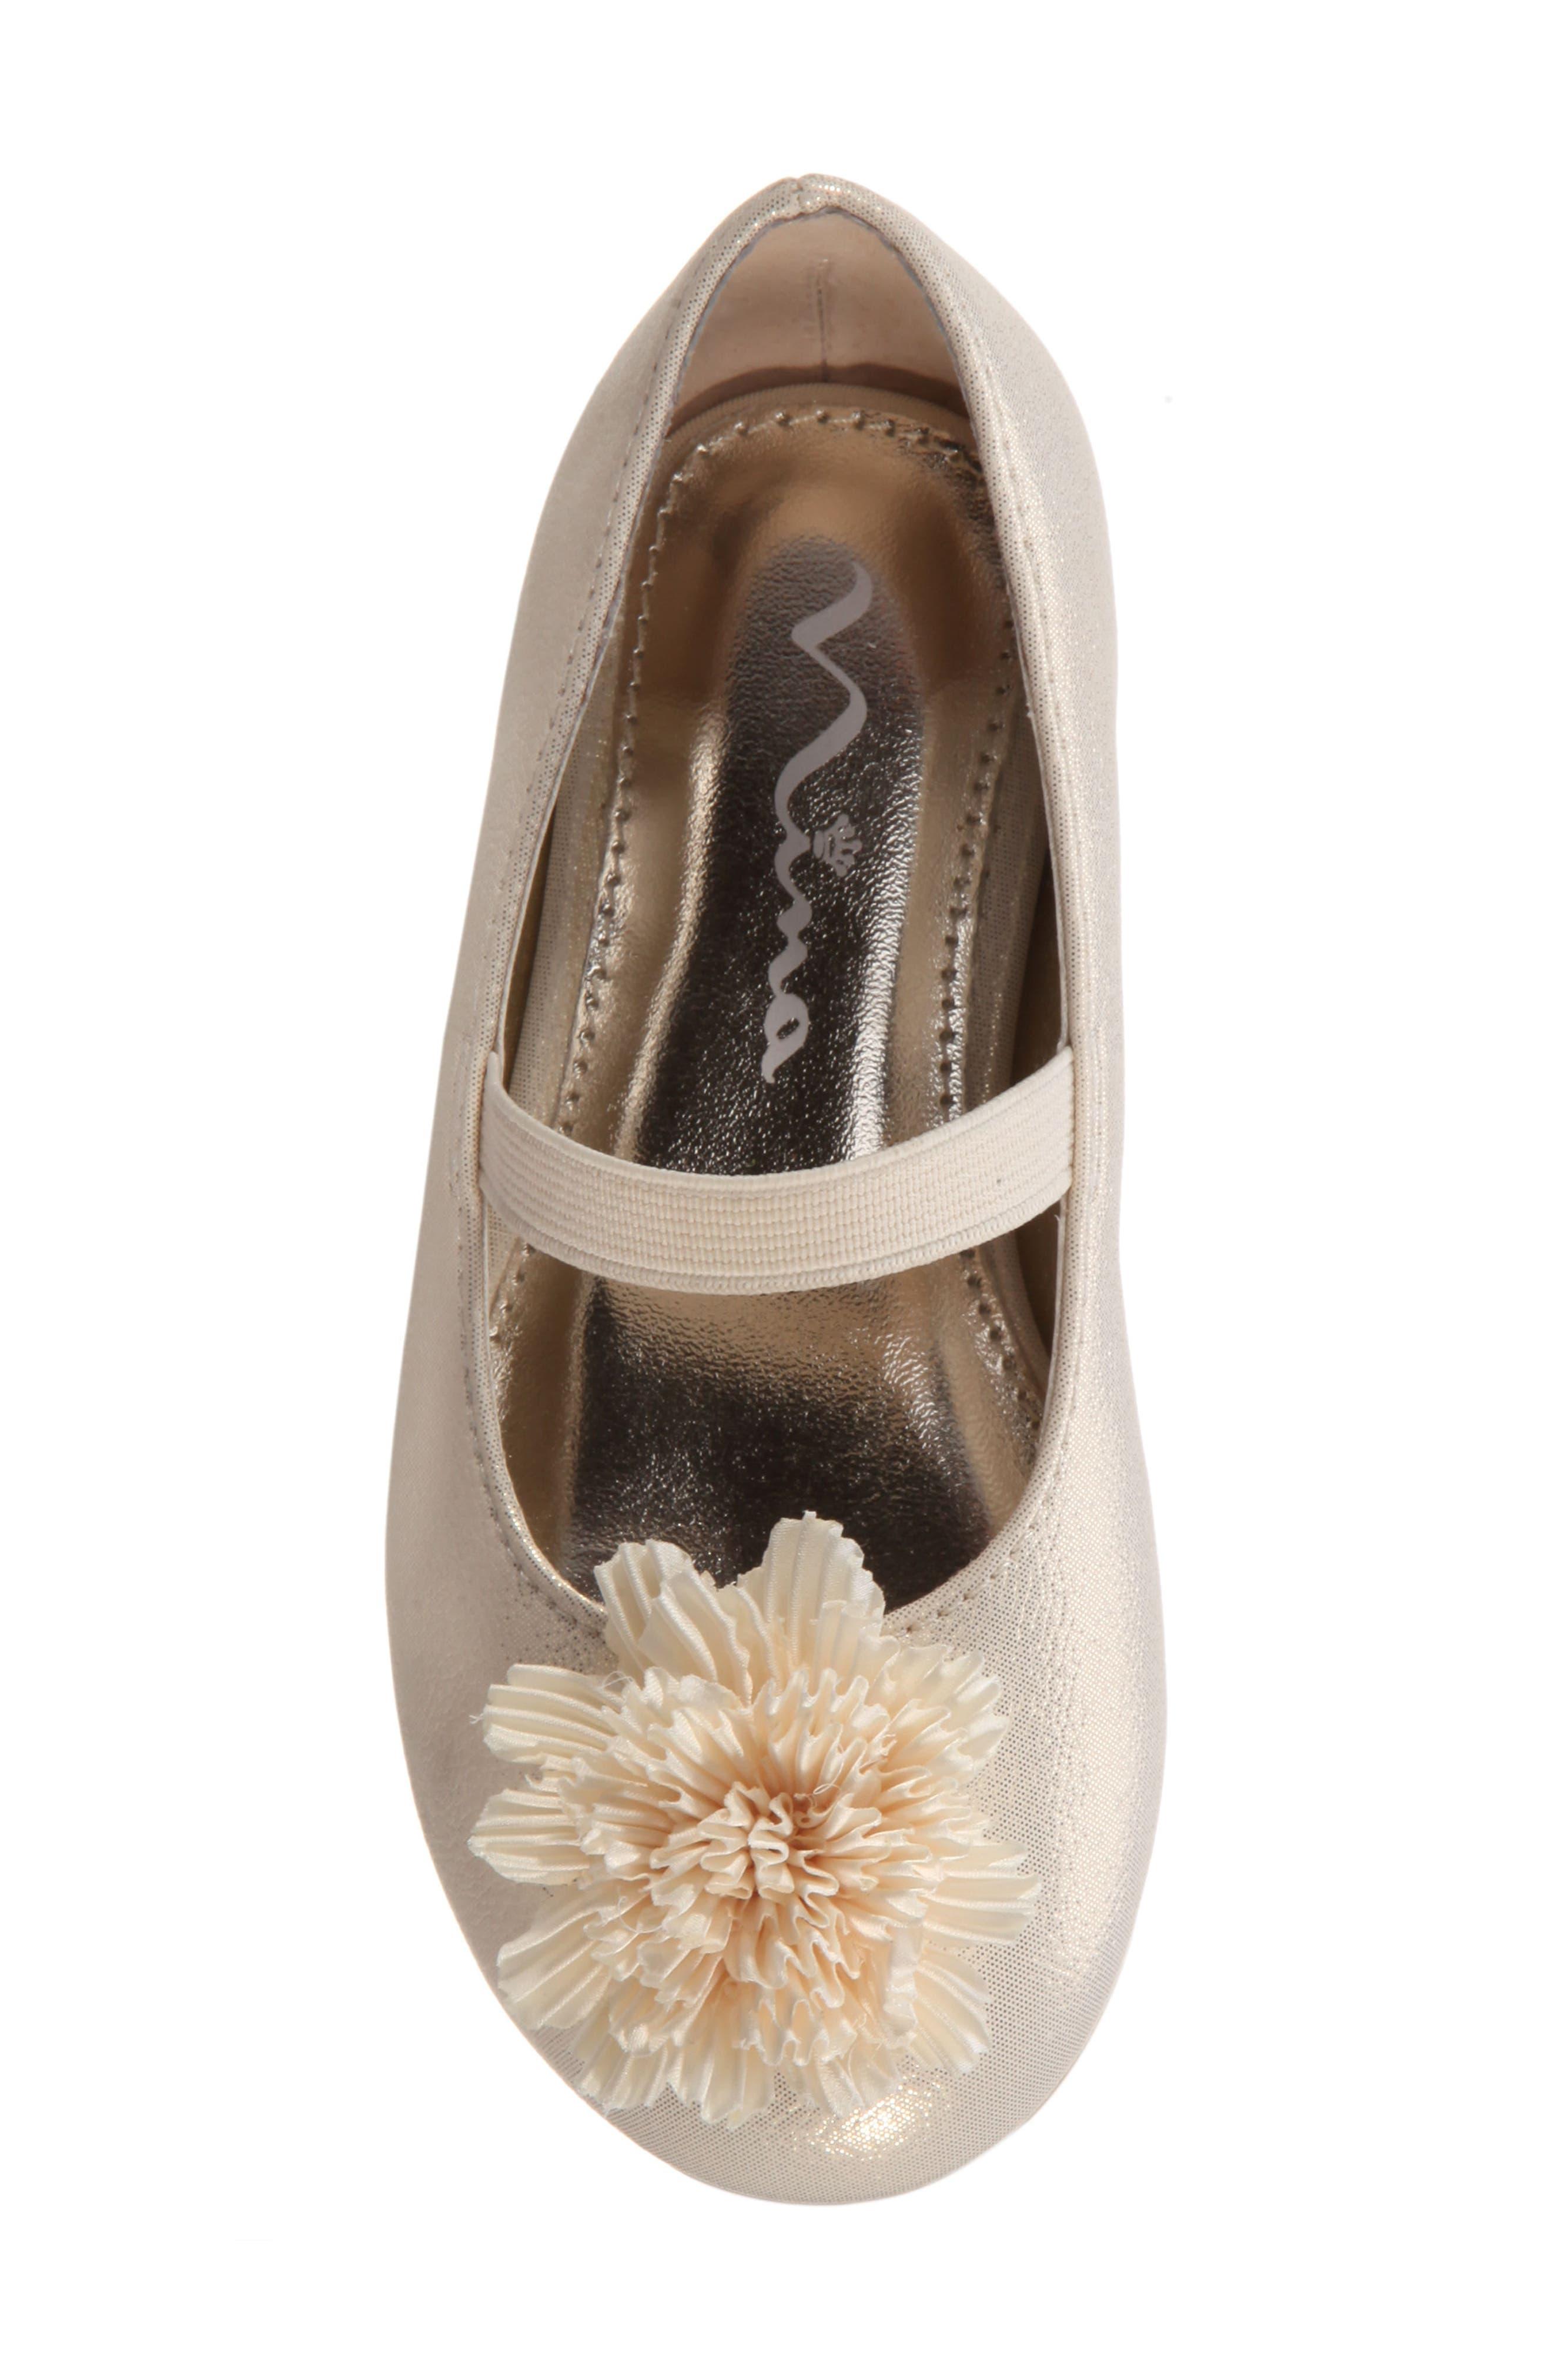 Jemma-T Bow Ballet Flat,                             Alternate thumbnail 5, color,                             040